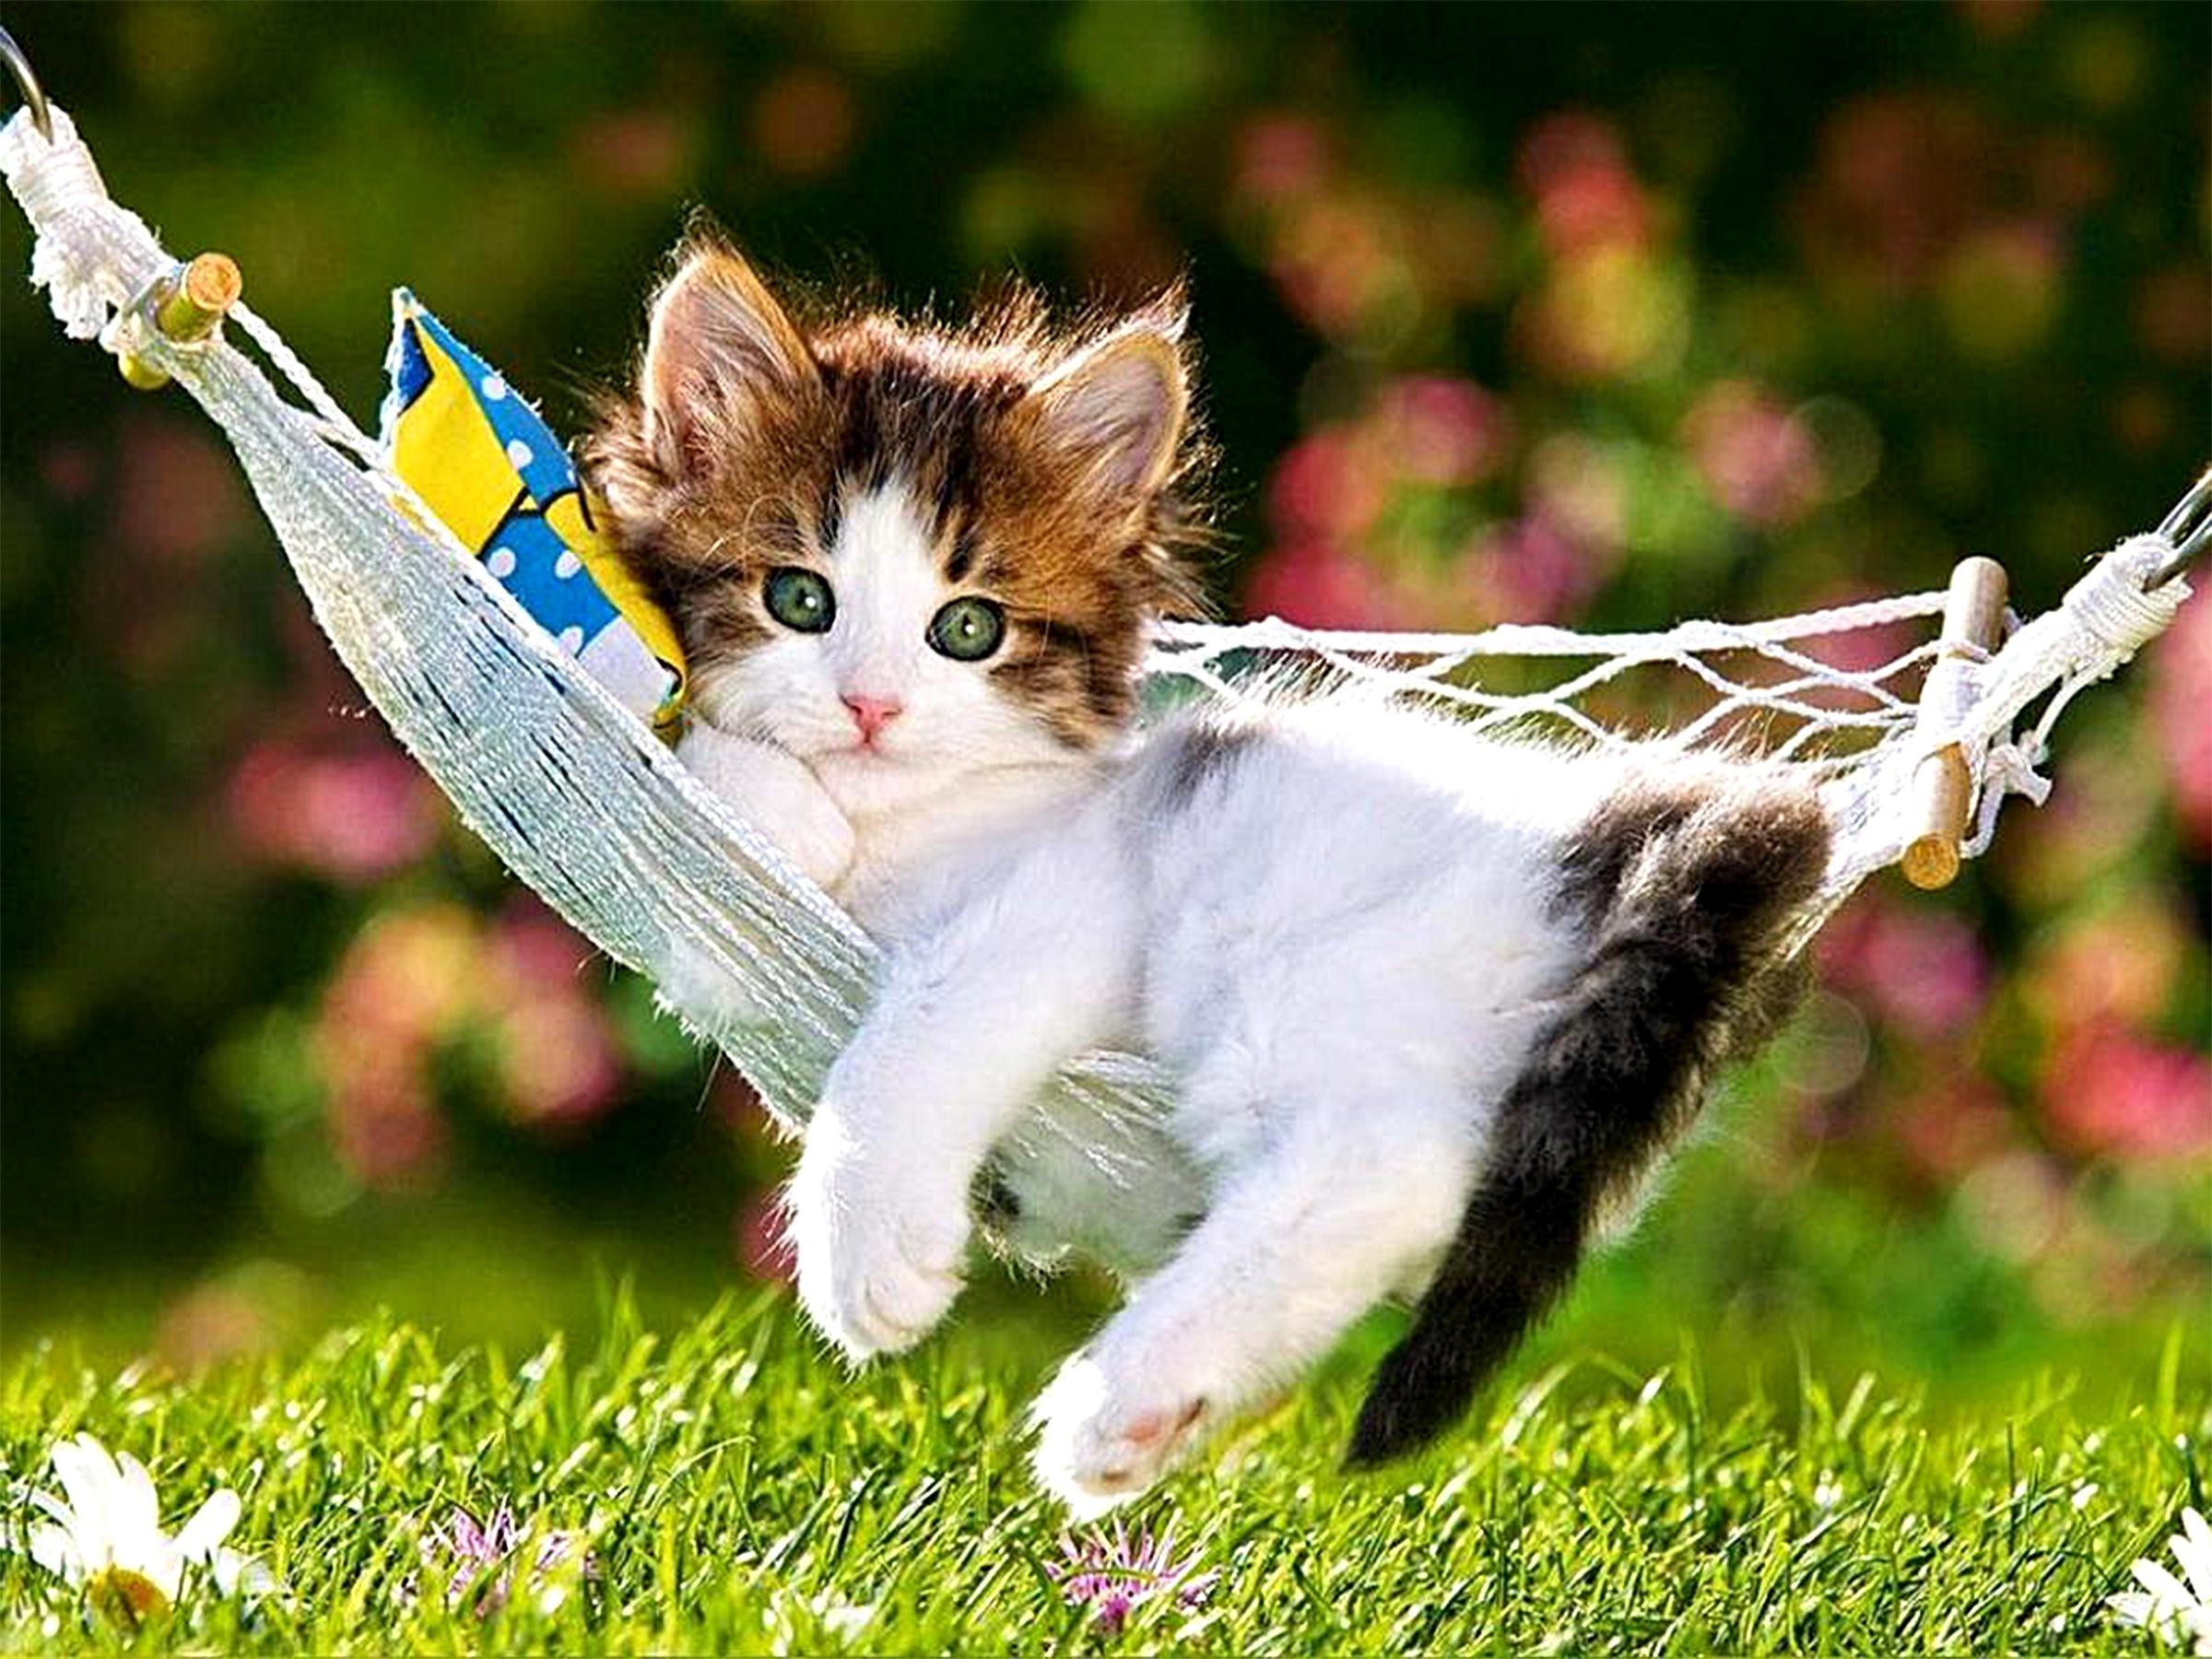 wallpaper.wiki-beautiful-creative-cute-cat-kitty-kitten-with-flowers